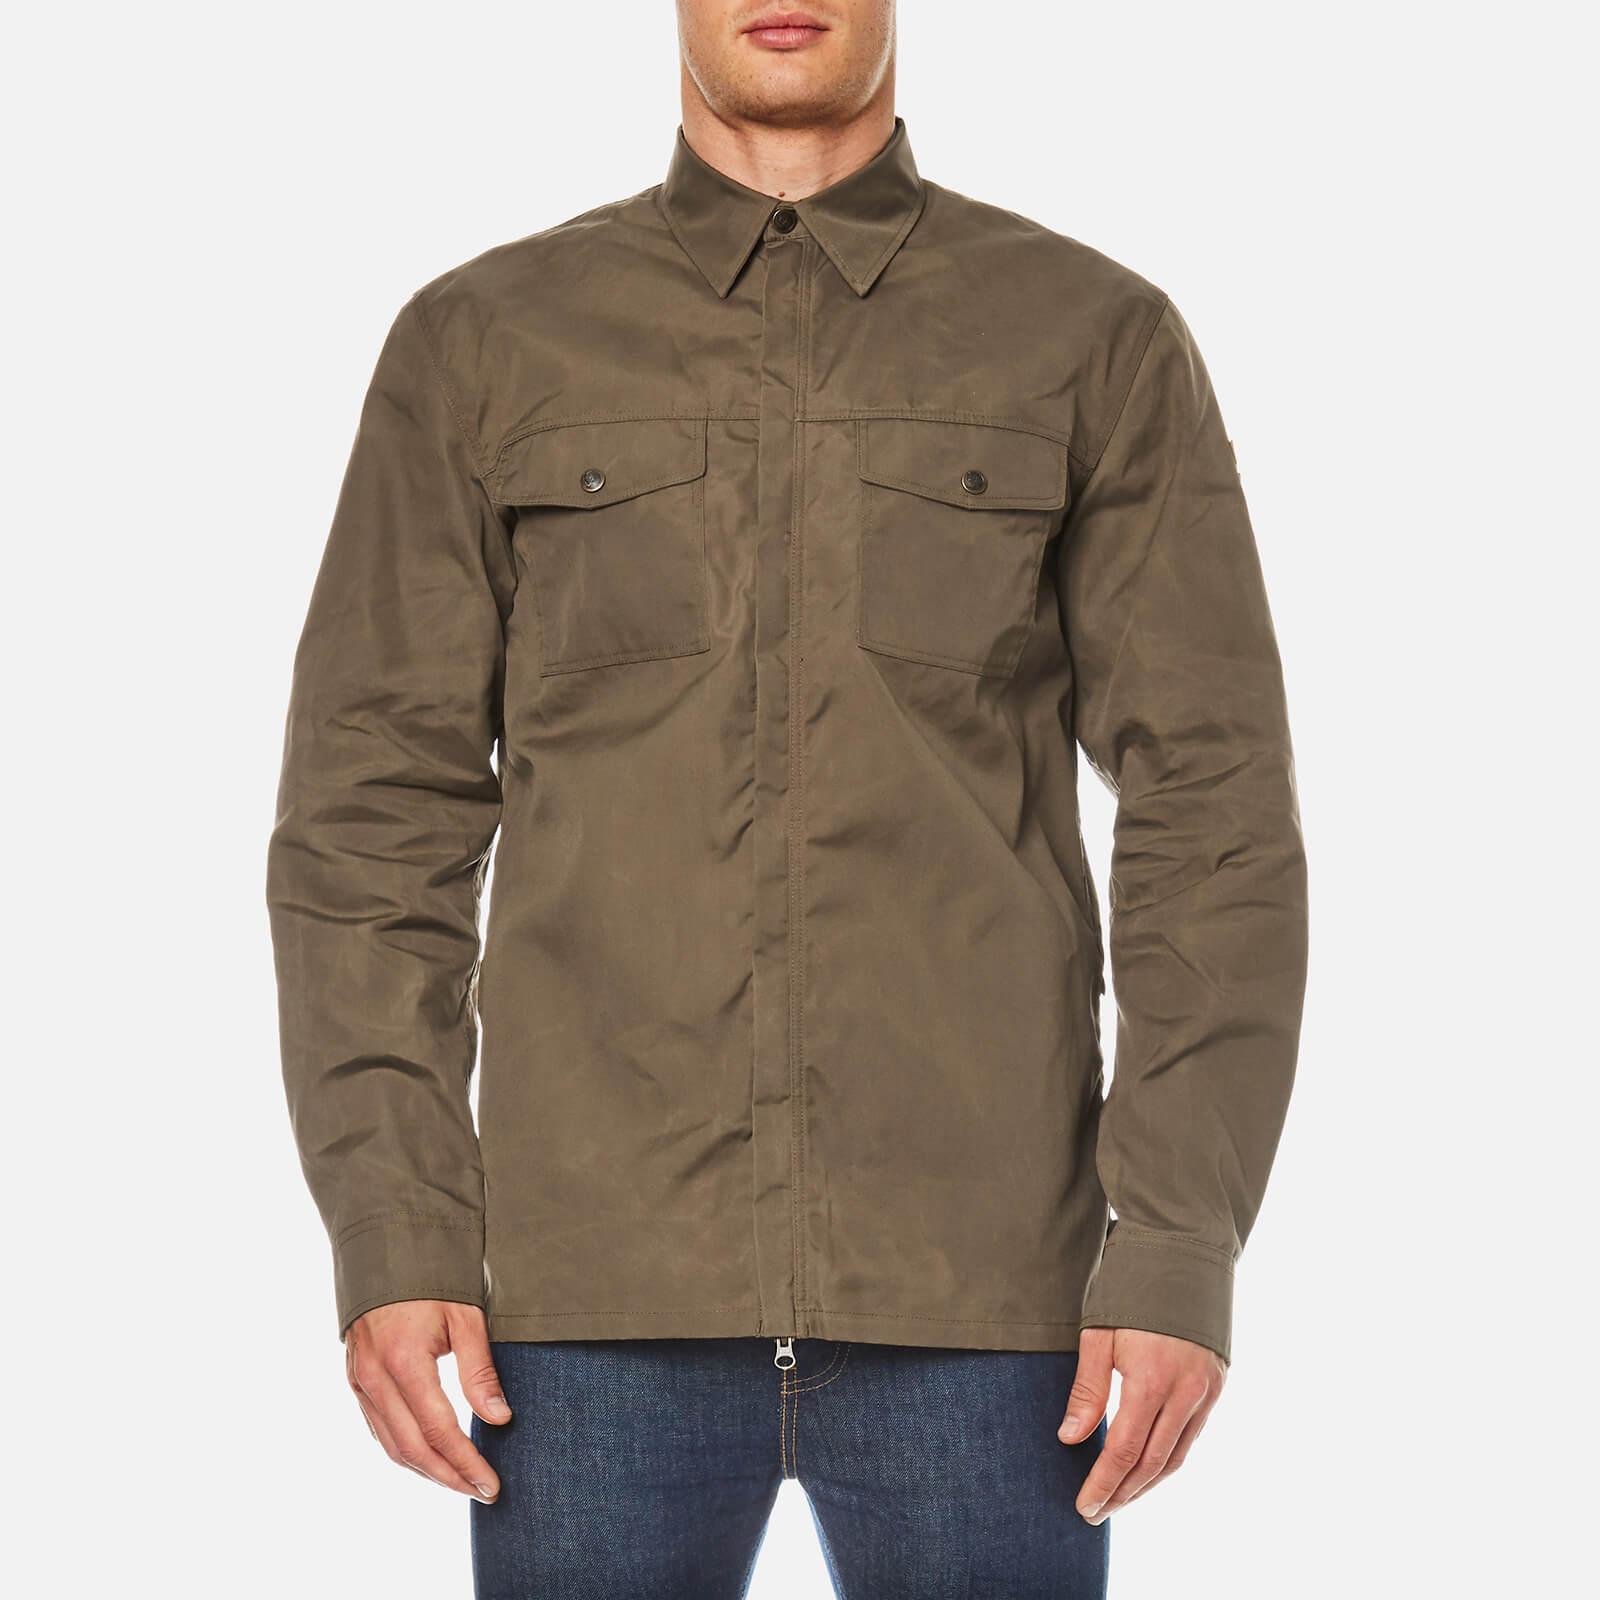 100% authentic 27034 19140 Fjallraven Men's G-1000 Long Sleeve Shirt - Tarmac